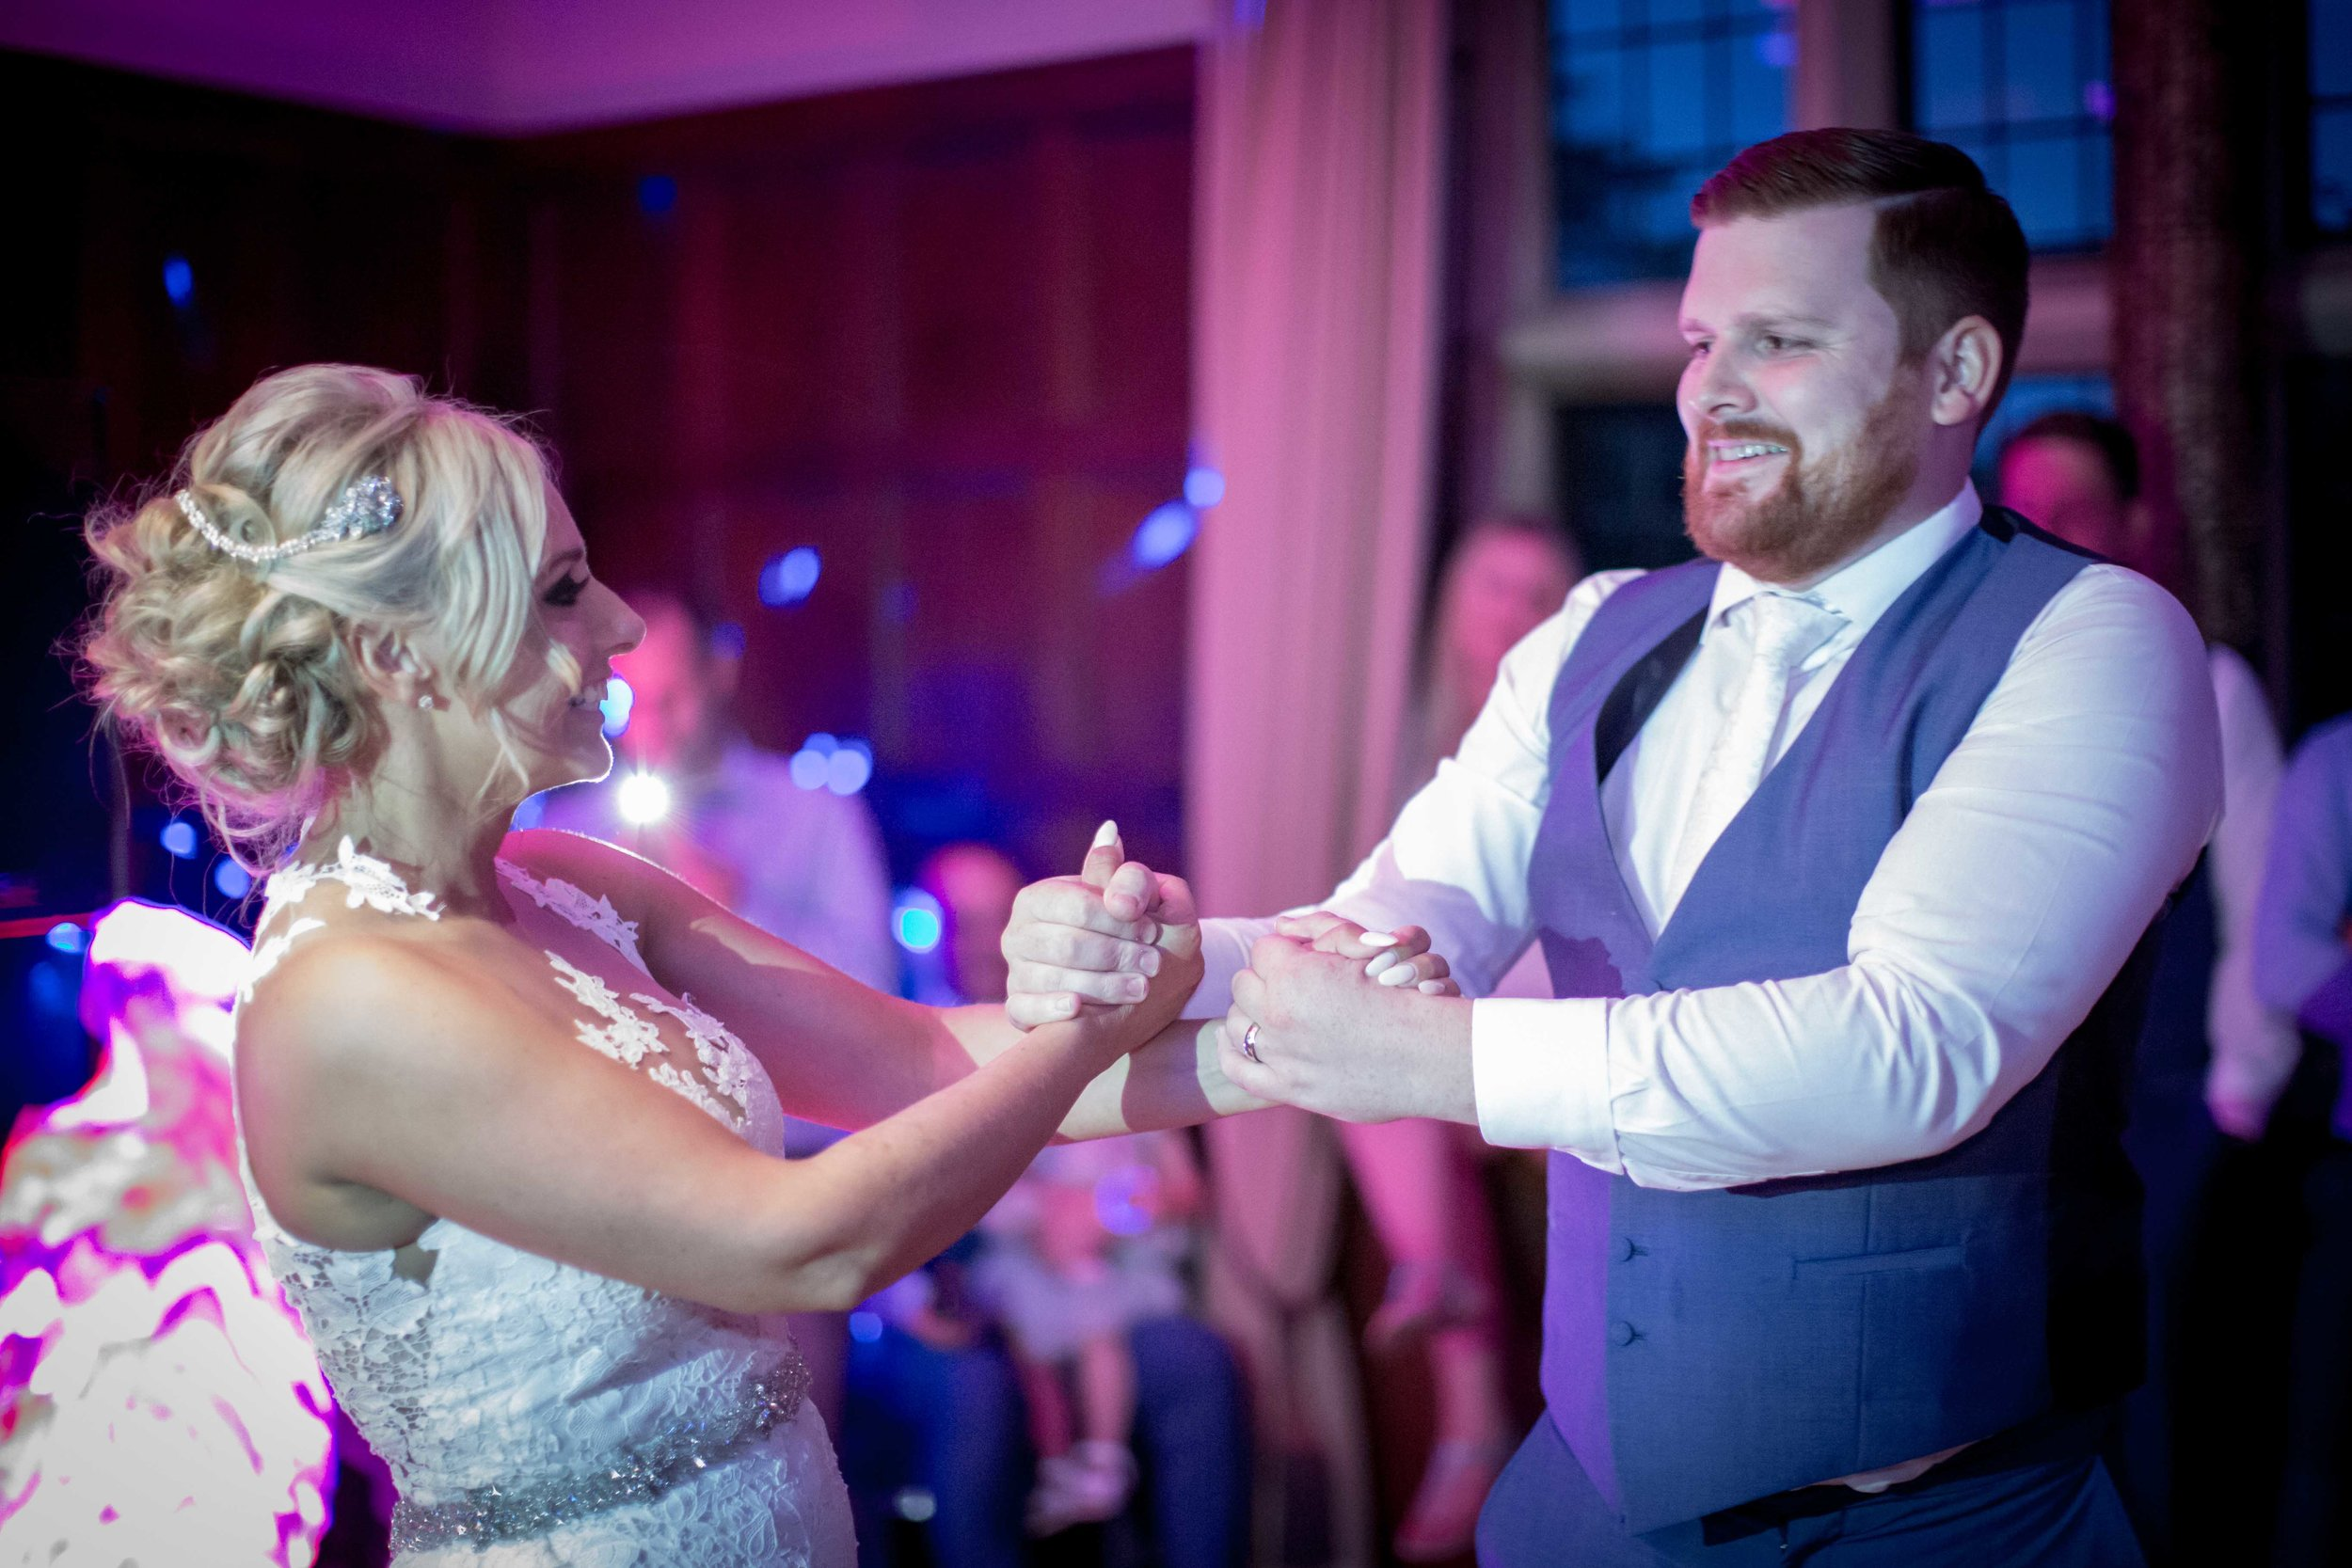 cotswold-wedding-photography-at-stonehouse-court-hotel-natalia-smith-photography-gloucestershire-wedding-photographer-91.jpg